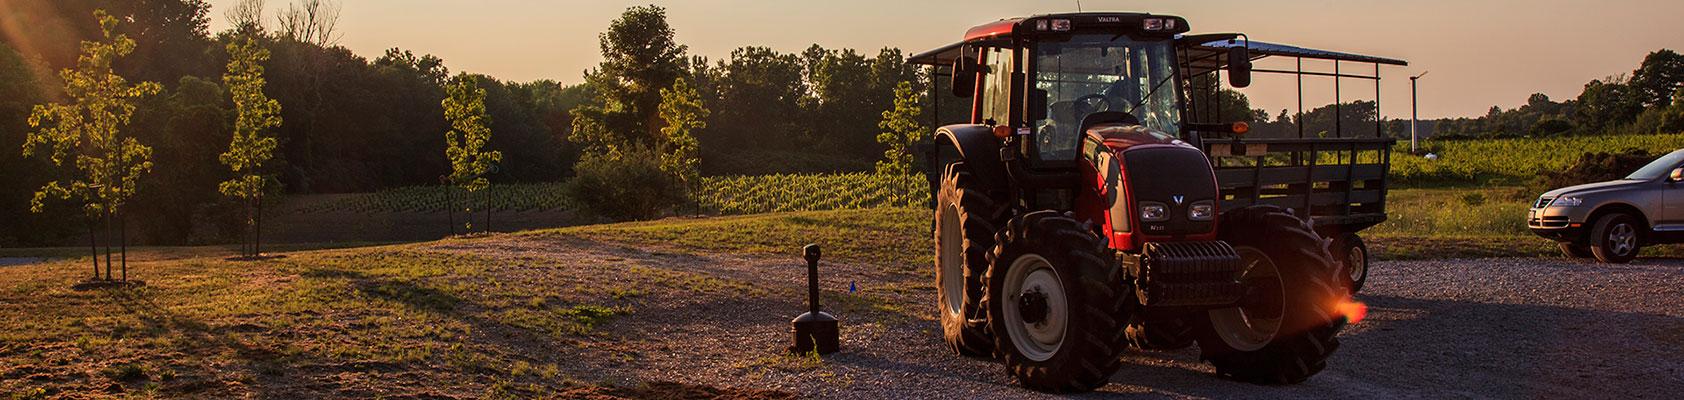 Photo-Tractor-2012-07-11-Fruit-_-Veg-Tech-Exchange-034.jpg